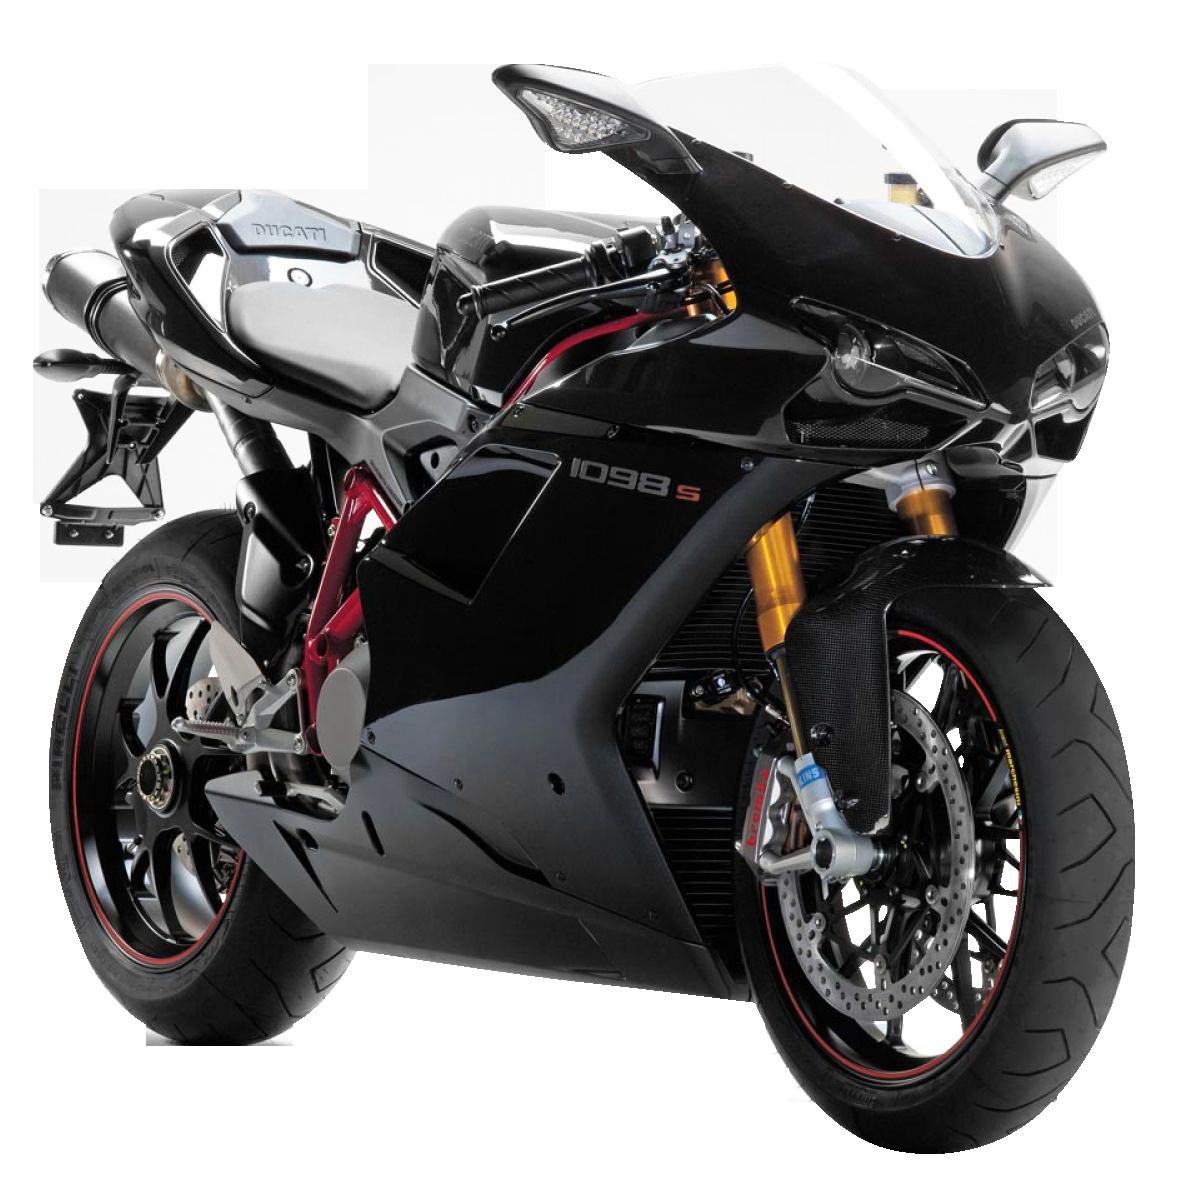 Png amazing yamaha r. Motorcycle clipart biker